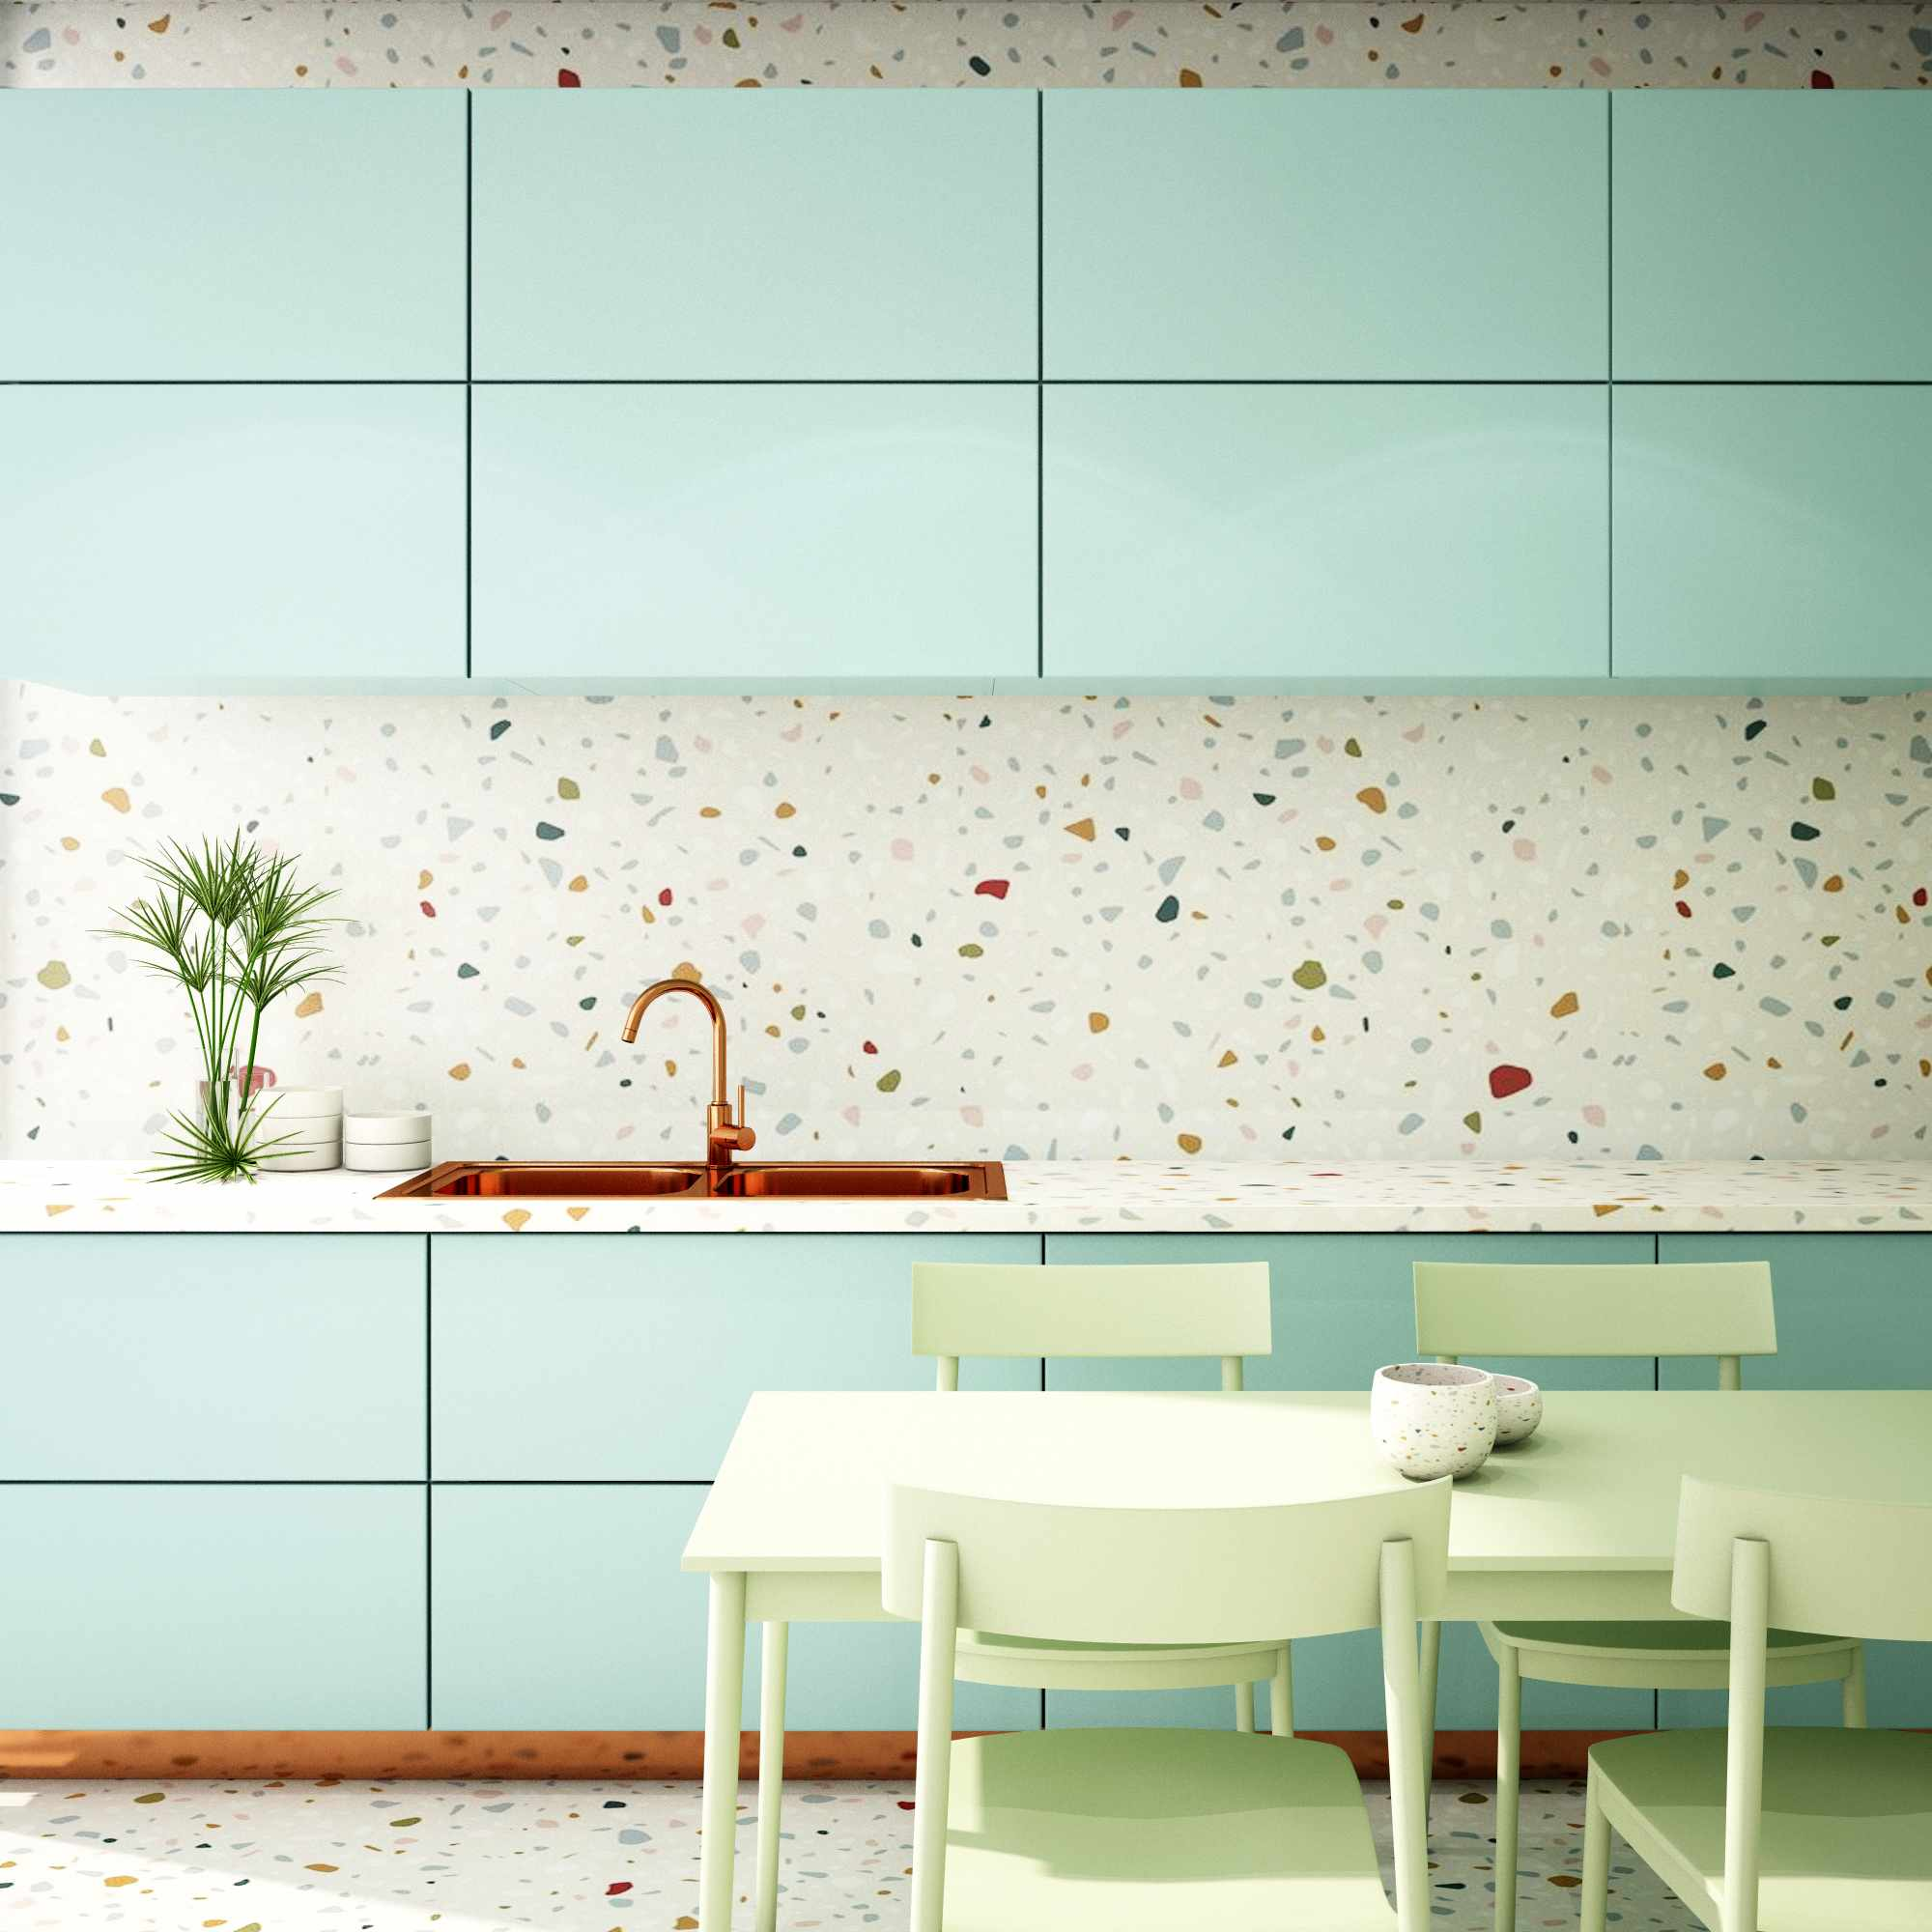 Terrazzo kitchen backsplash